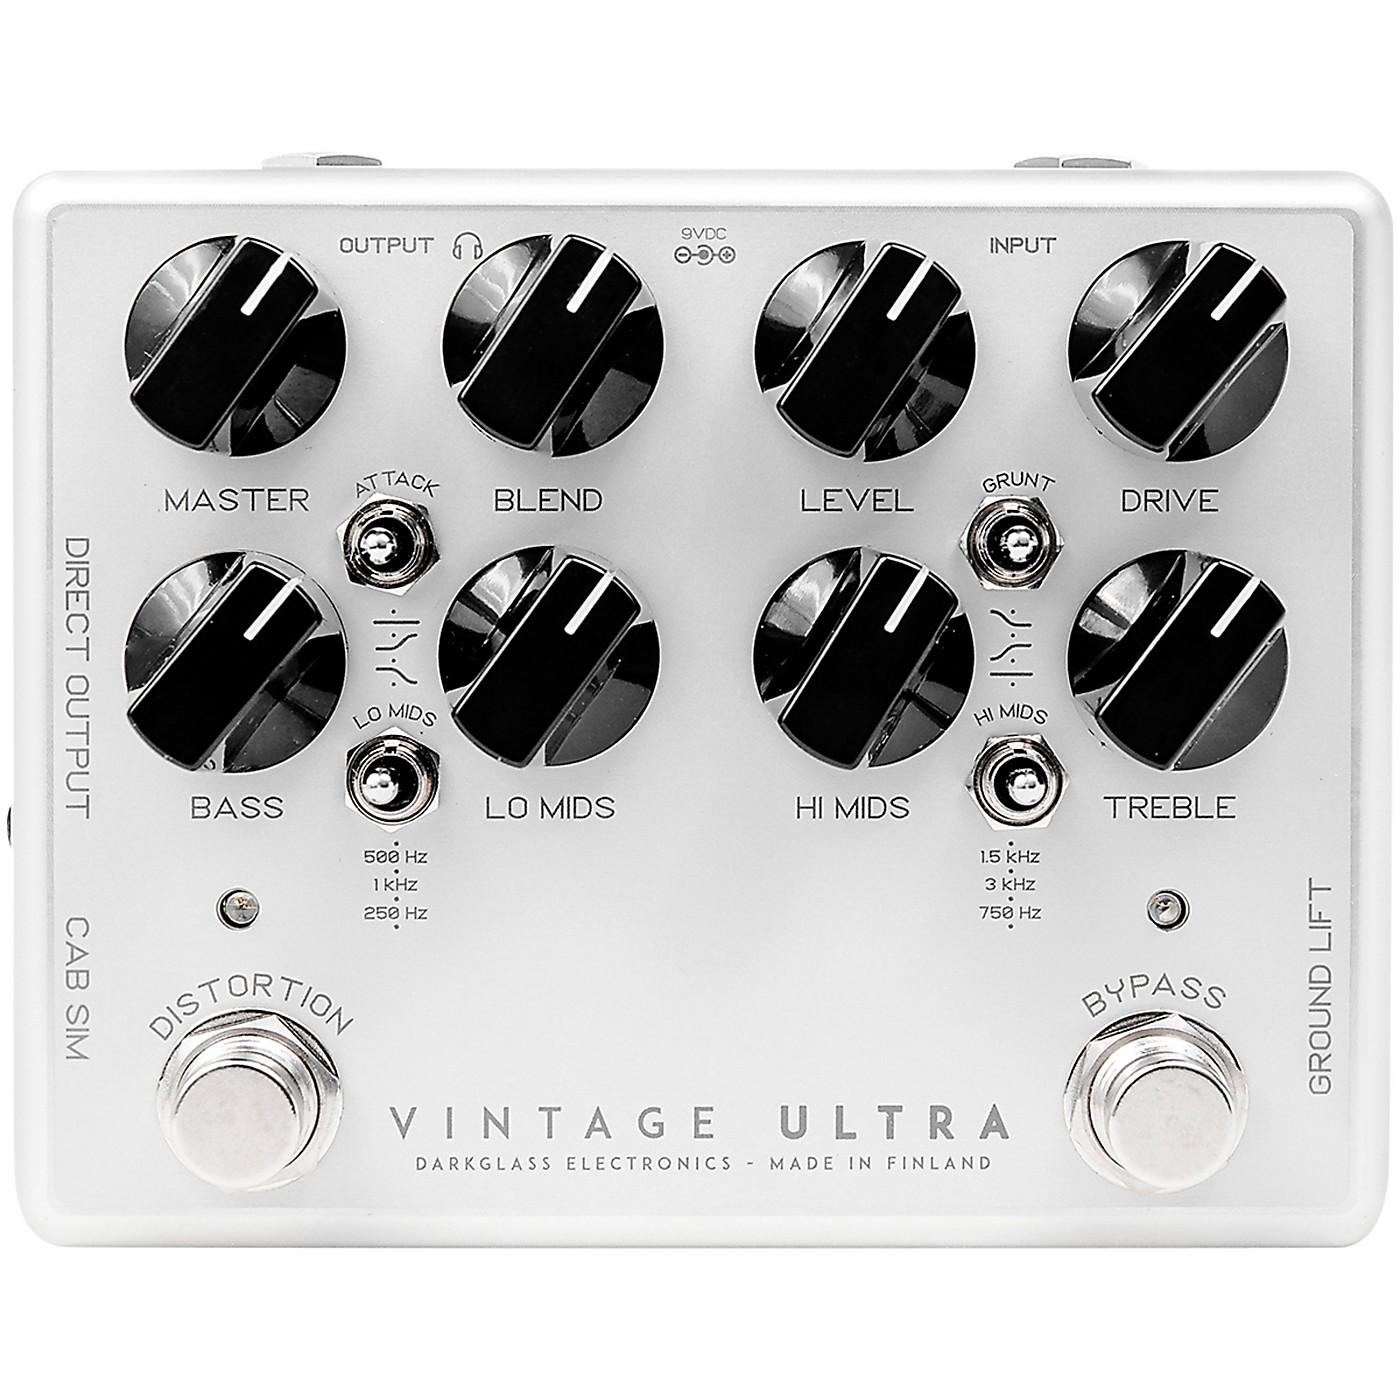 Darkglass Vintage Ultra V2 Bass Preamp Pedal thumbnail